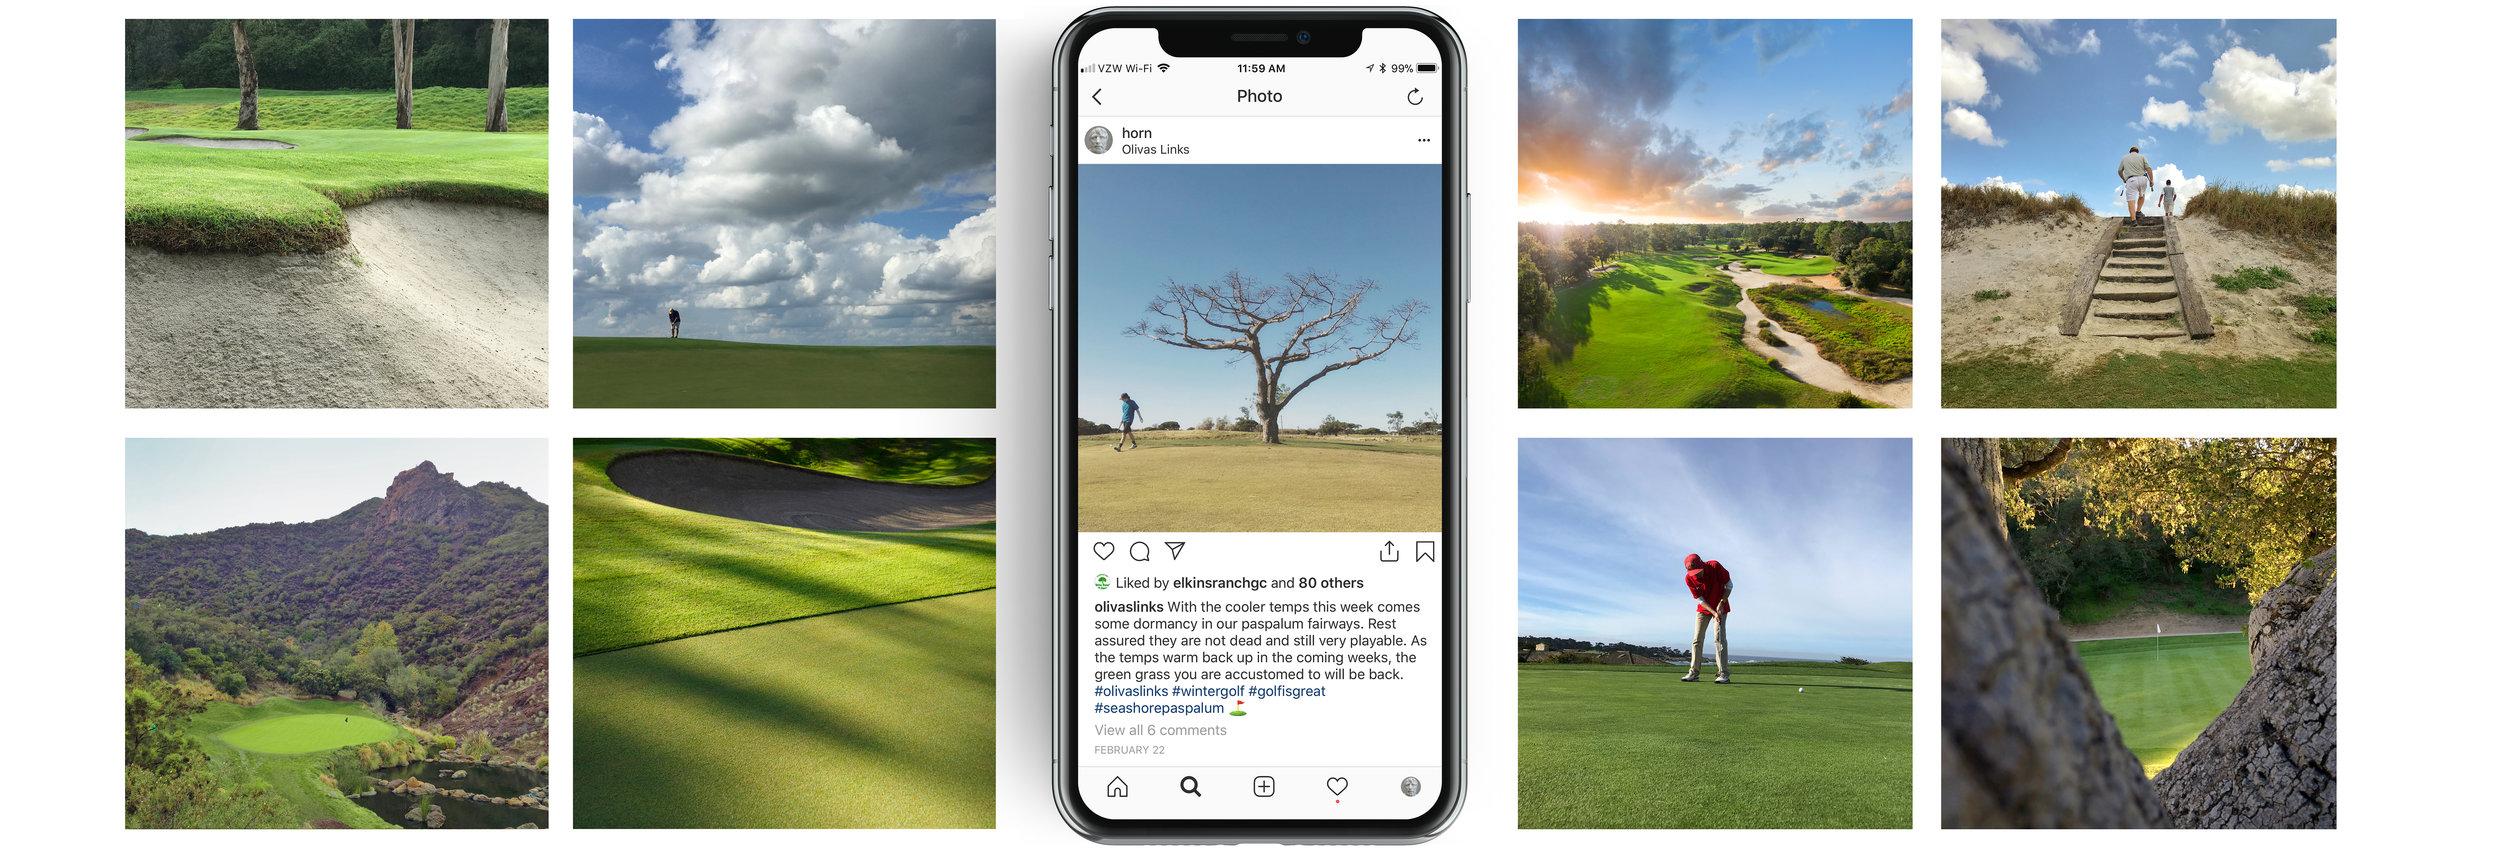 iPhone x vert golf3.jpg